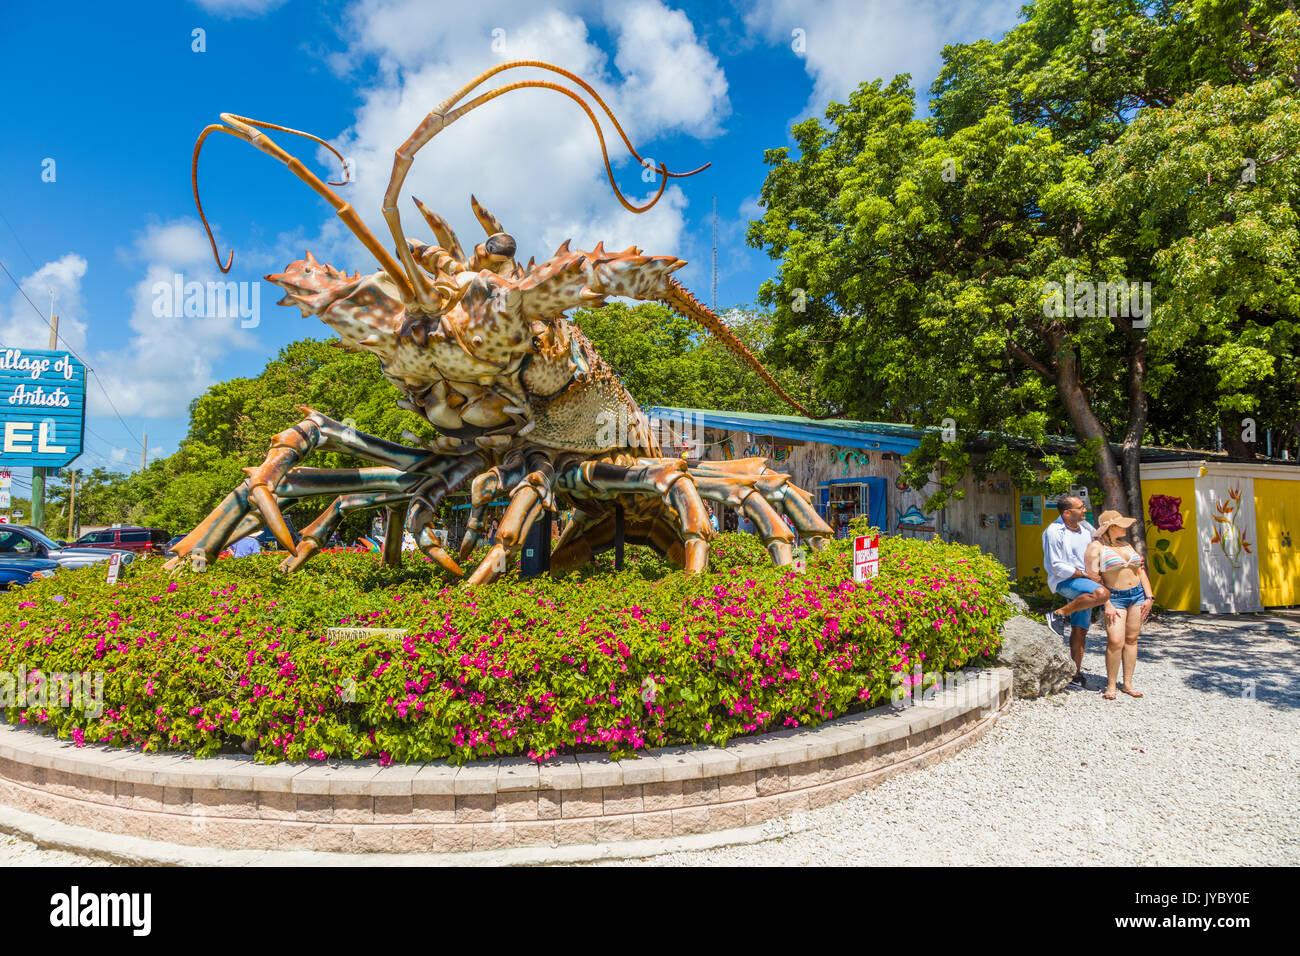 Betsy  the 30-foot-tall, 40-foot-long lobster at The Rain Barrel Artisan Village on Islamorada Key in the Florida Keys - Stock Image